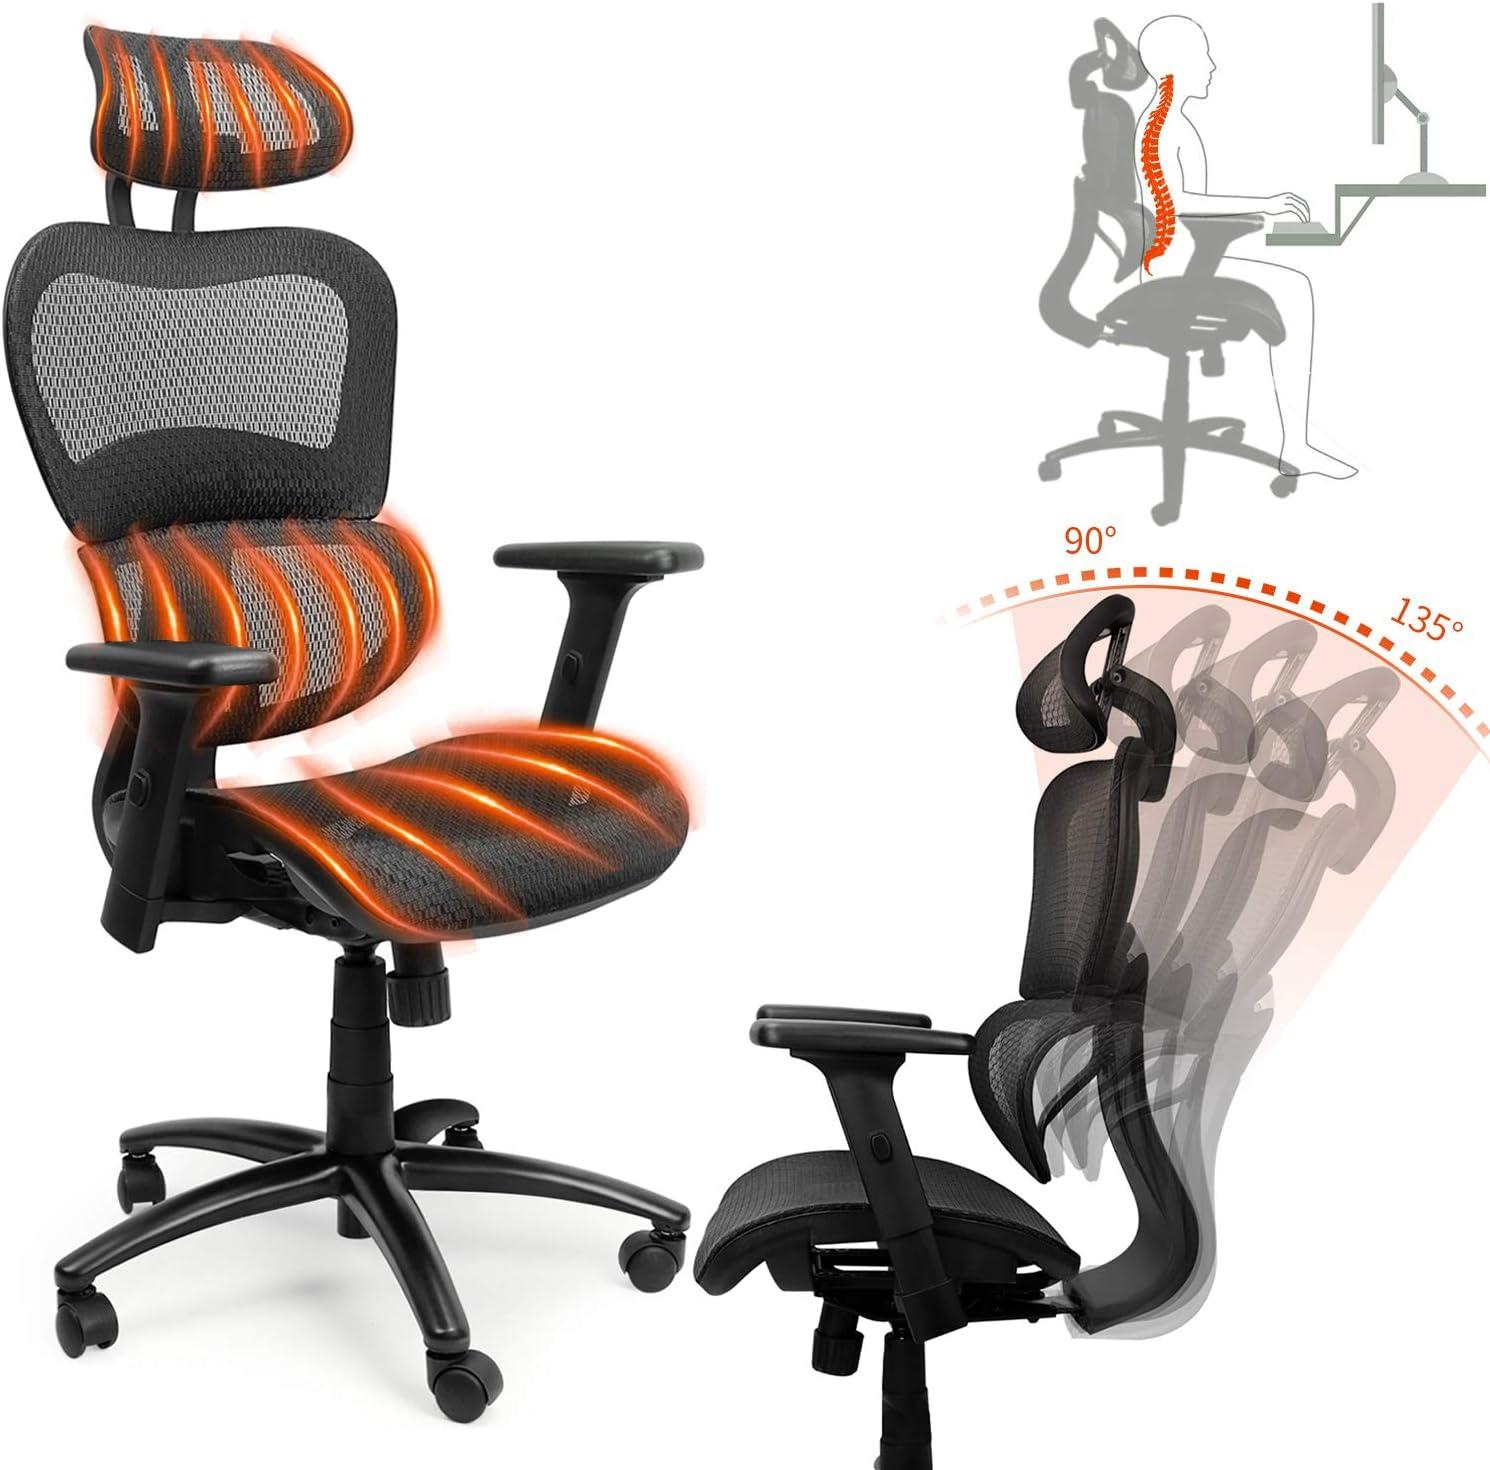 Ergousit Ergonomic Office Desk Chair Adjustable Headrest 3D Flip-up Armrests Seat Height Ergonomic Computer Chair,Executive, Drafting, Gaming or Office Chair (Black)